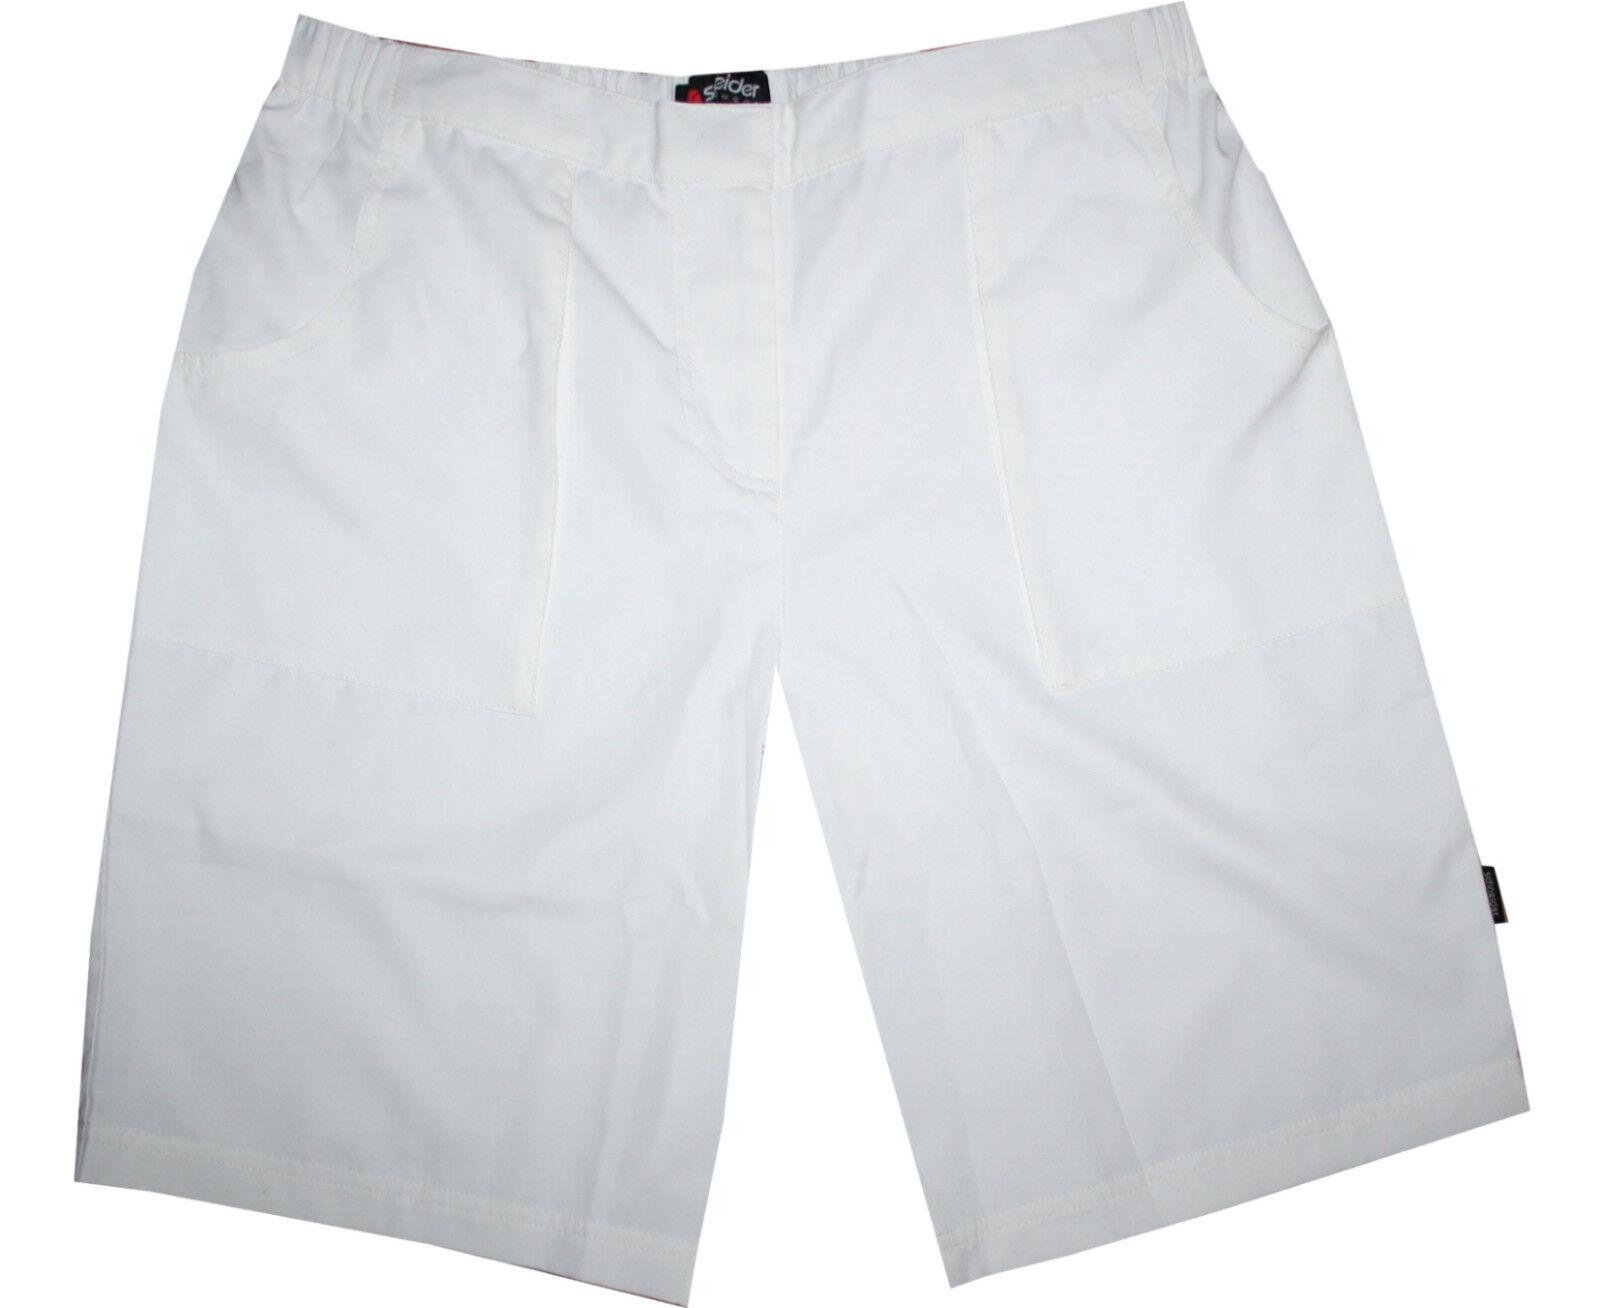 Schneider Sportswear Mellau Damen Short kurze Hose